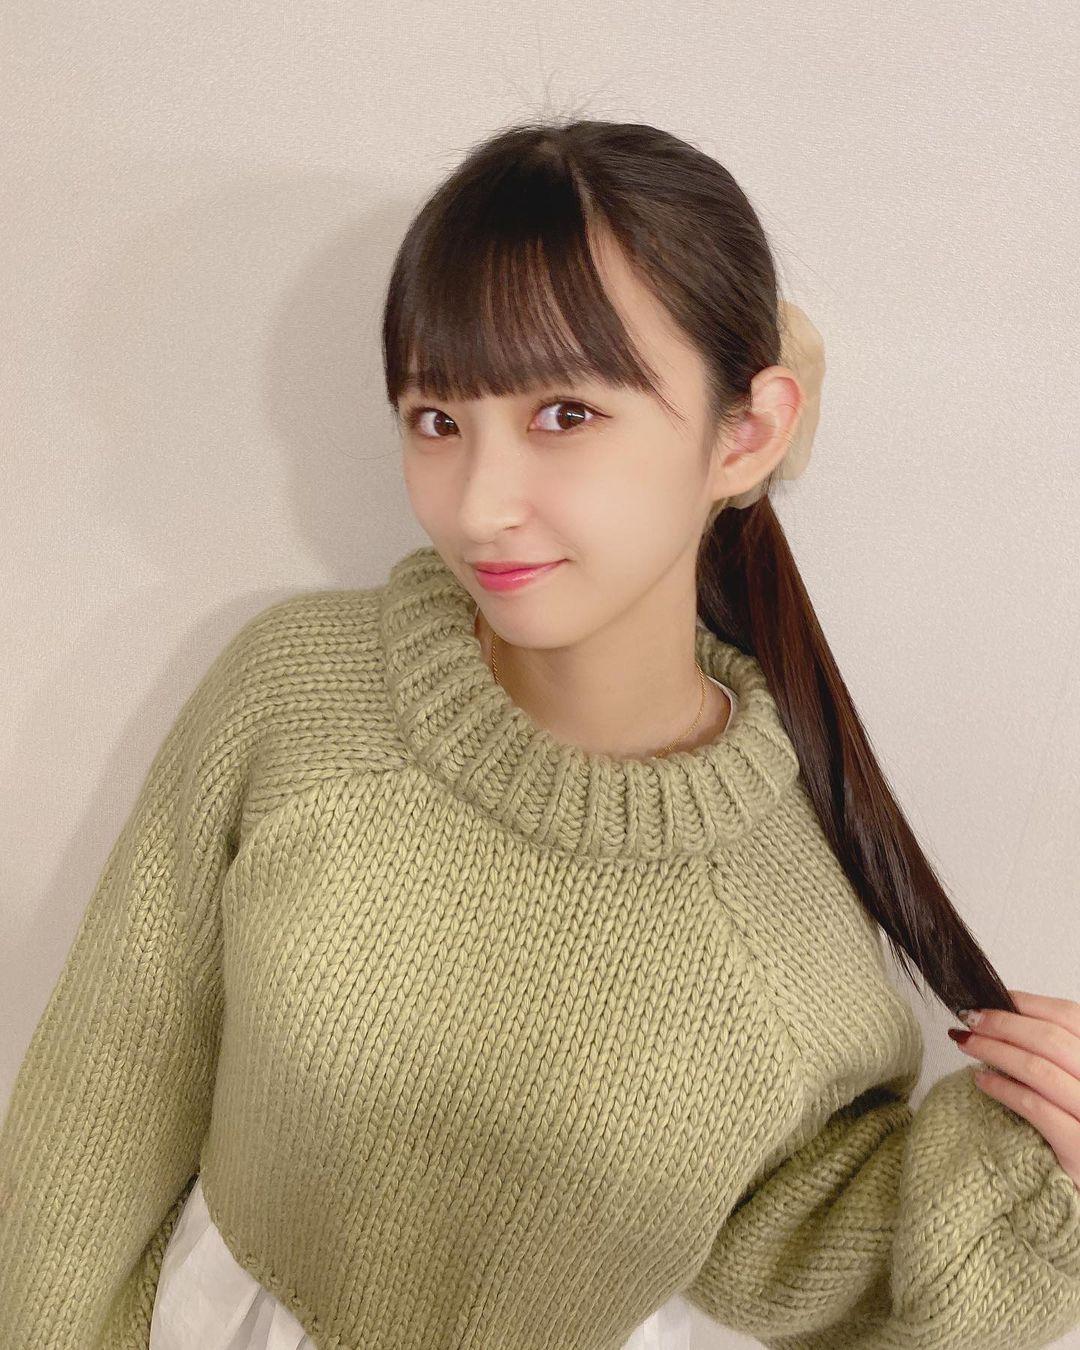 HKT48气质长发美少女「松本日向」,迷人笑容散发满满初恋感卖萌-新图包